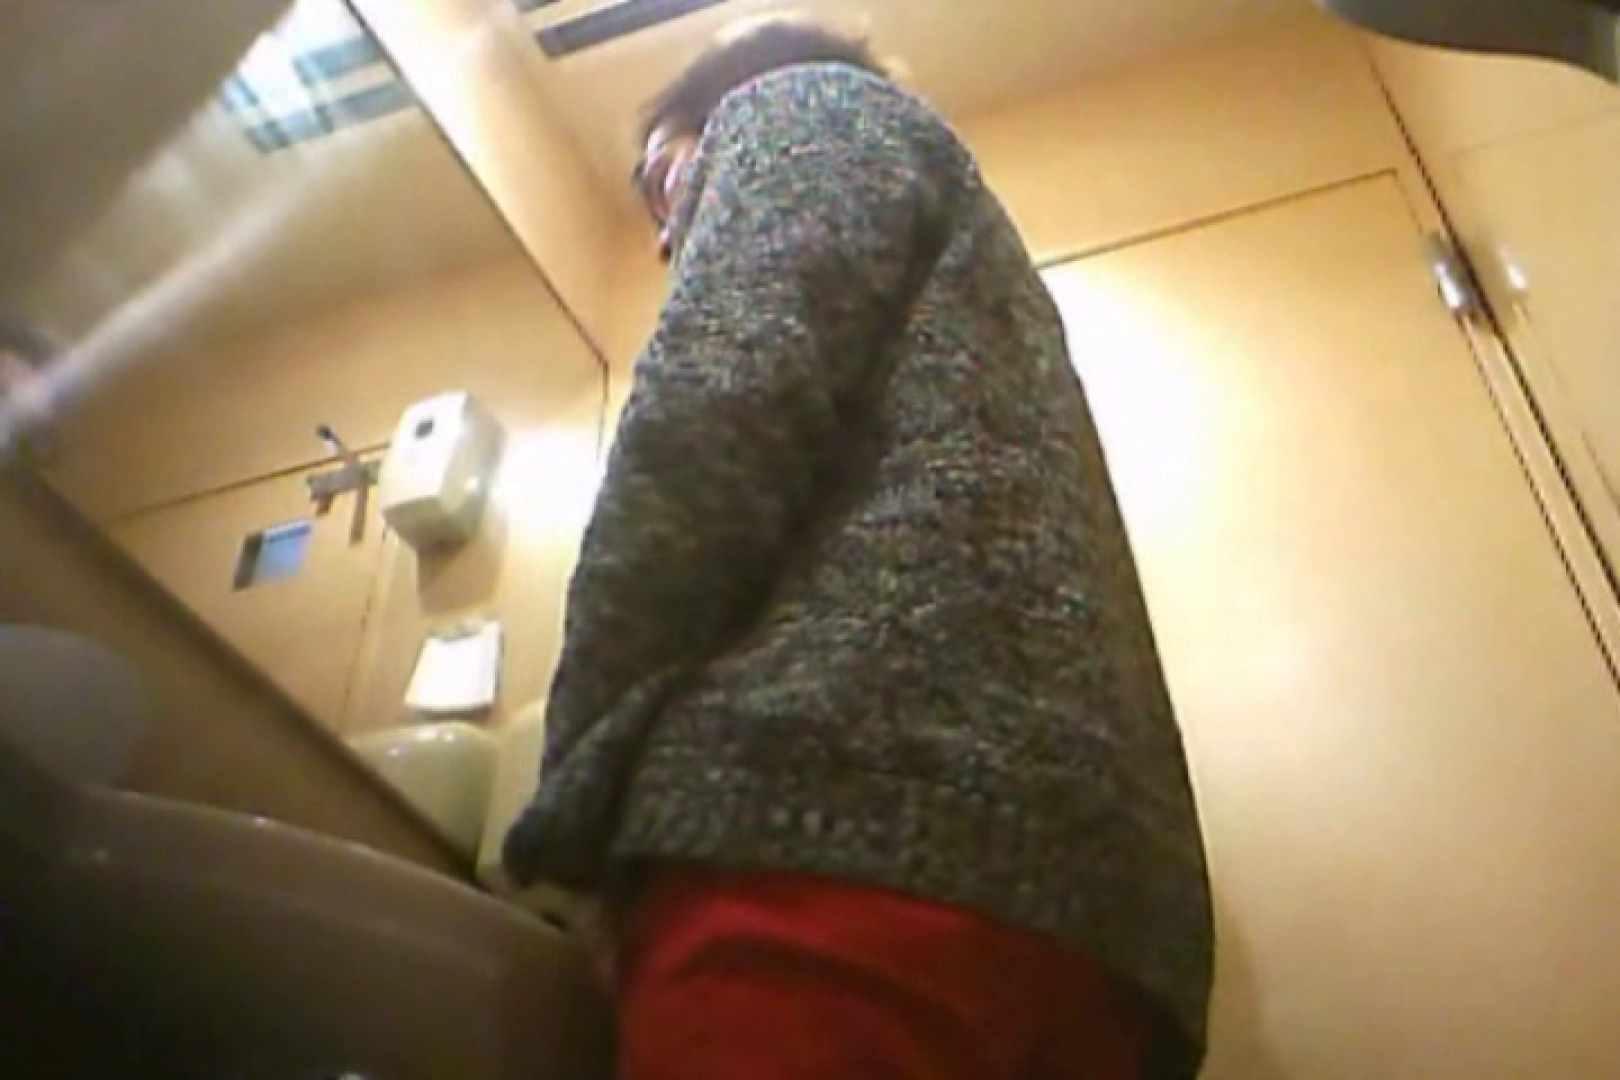 SEASON 3rd!掴み取りさんの洗面所覗き!in新幹線!VOL.21 私服 ゲイアダルト画像 108連発 84